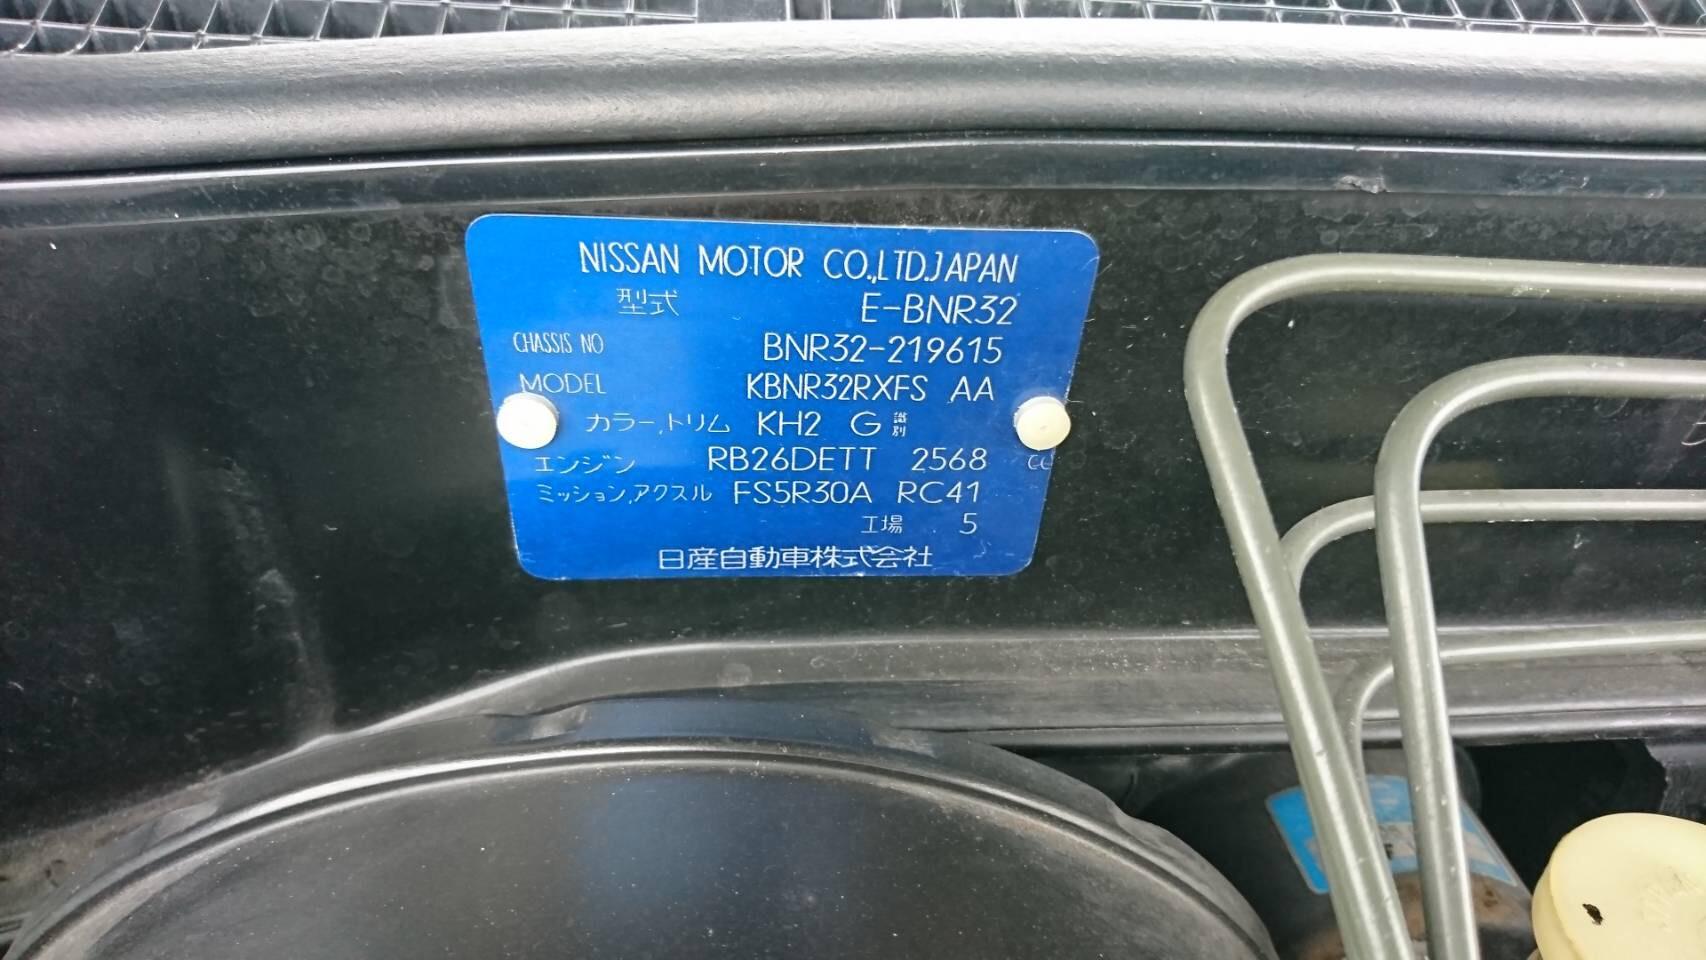 1992 Nissan Skyline R32 GTR VIN